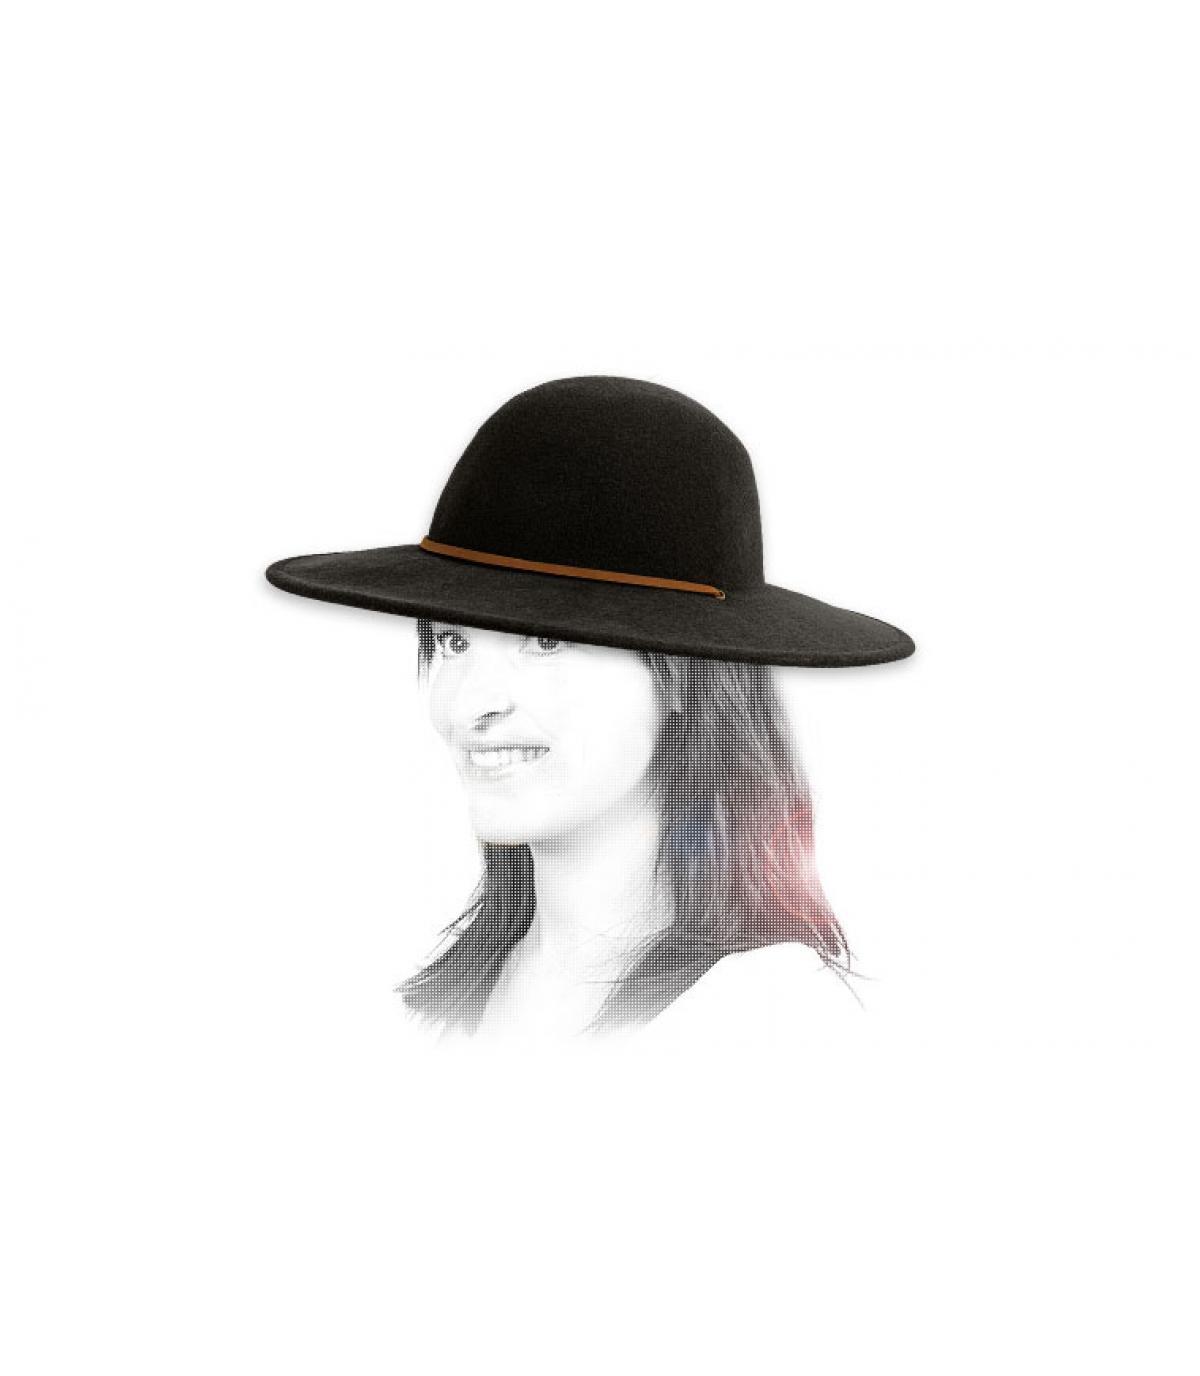 Détails Tiller black women hat - image 3